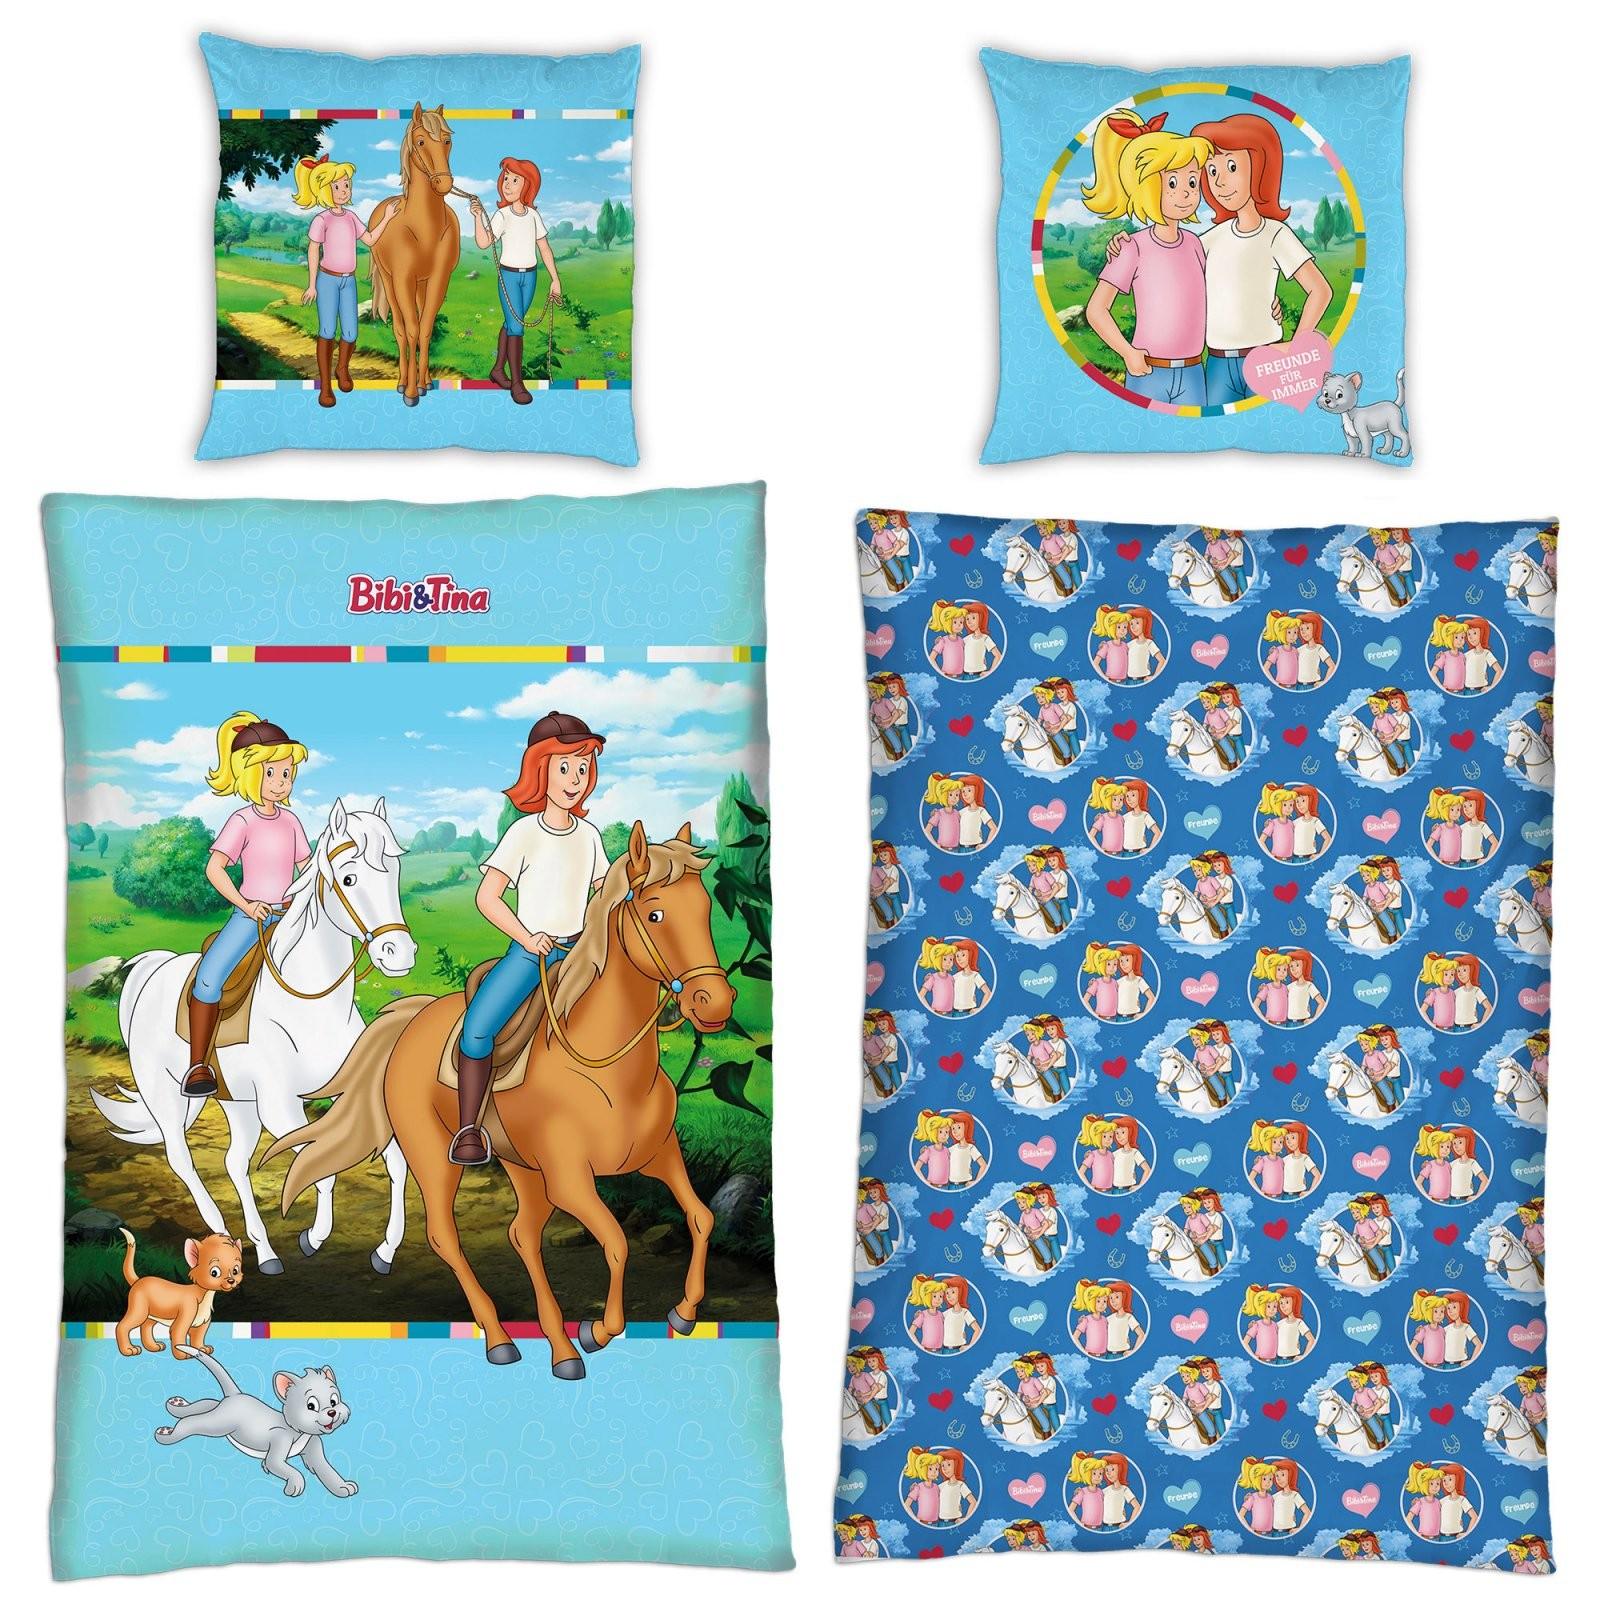 Linon Kinderbettwäsche Bibi Und Tina Minky 135X200 80X80 Cm von Bibi Und Tina Bettwäsche 135X200 Photo